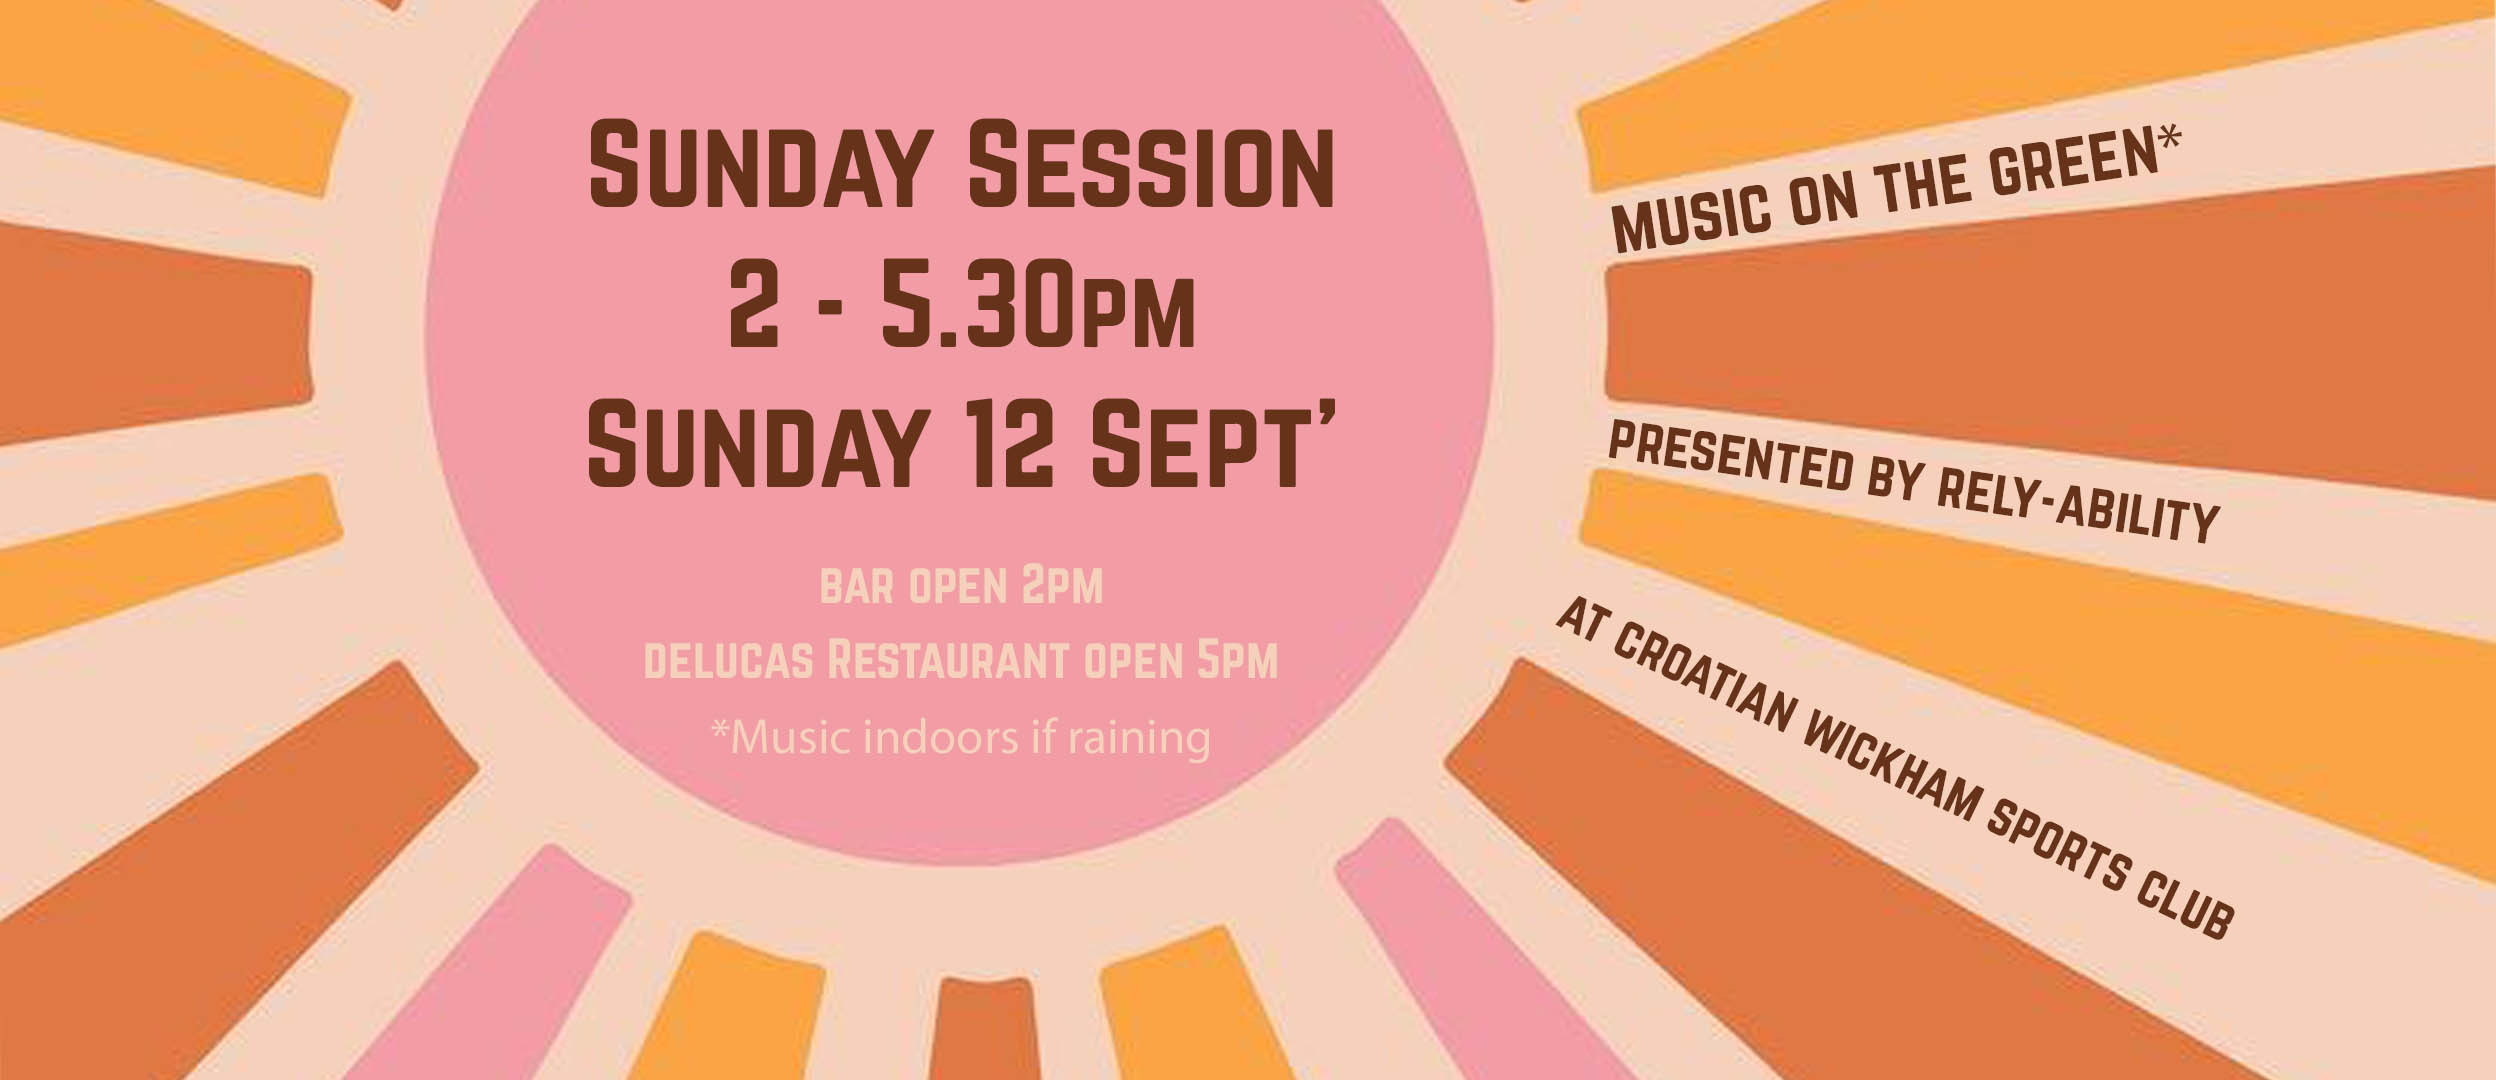 Sunday Session 2.00pm -5.30pm